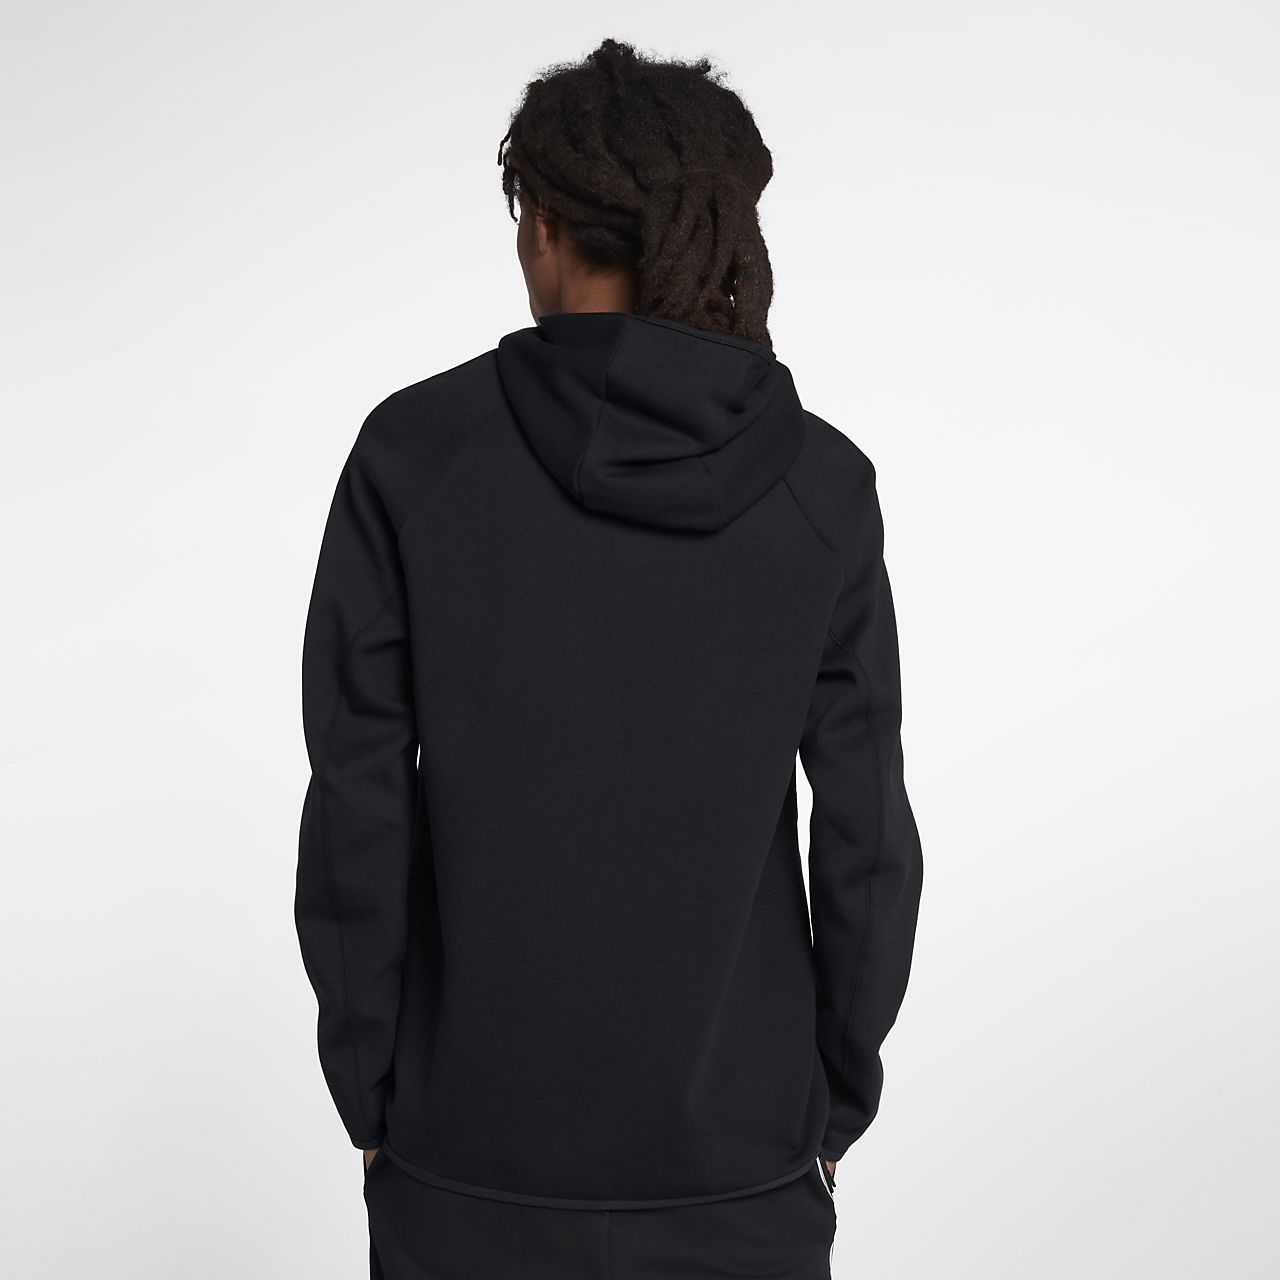 7e238571b4 Nike Sportswear Tech Fleece férfi kapucnis pulóver. Nike.com HU